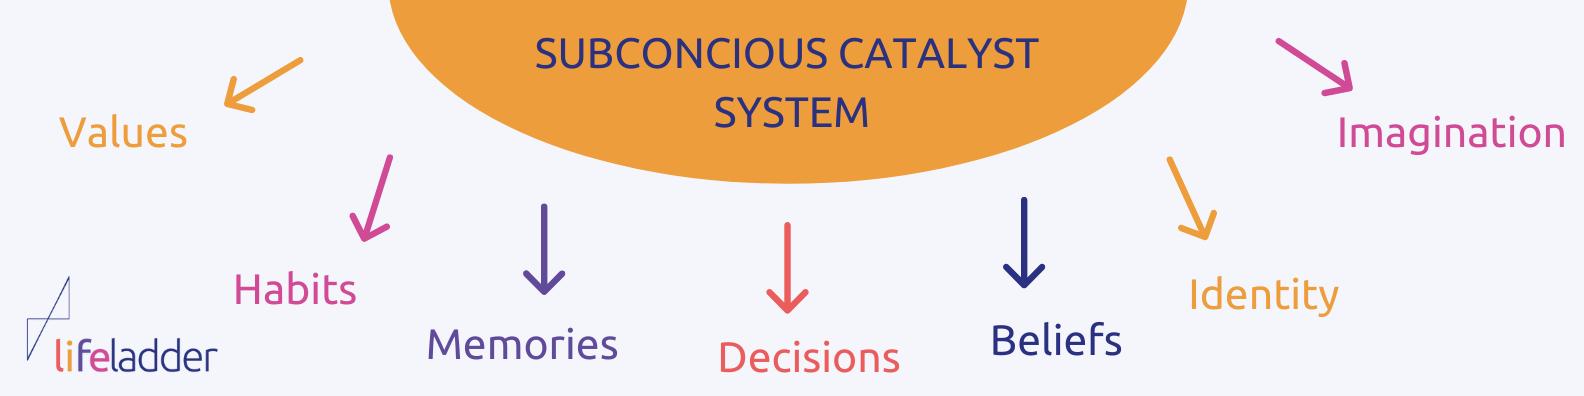 SUBCONCIOUS CATALYST SYSTEM